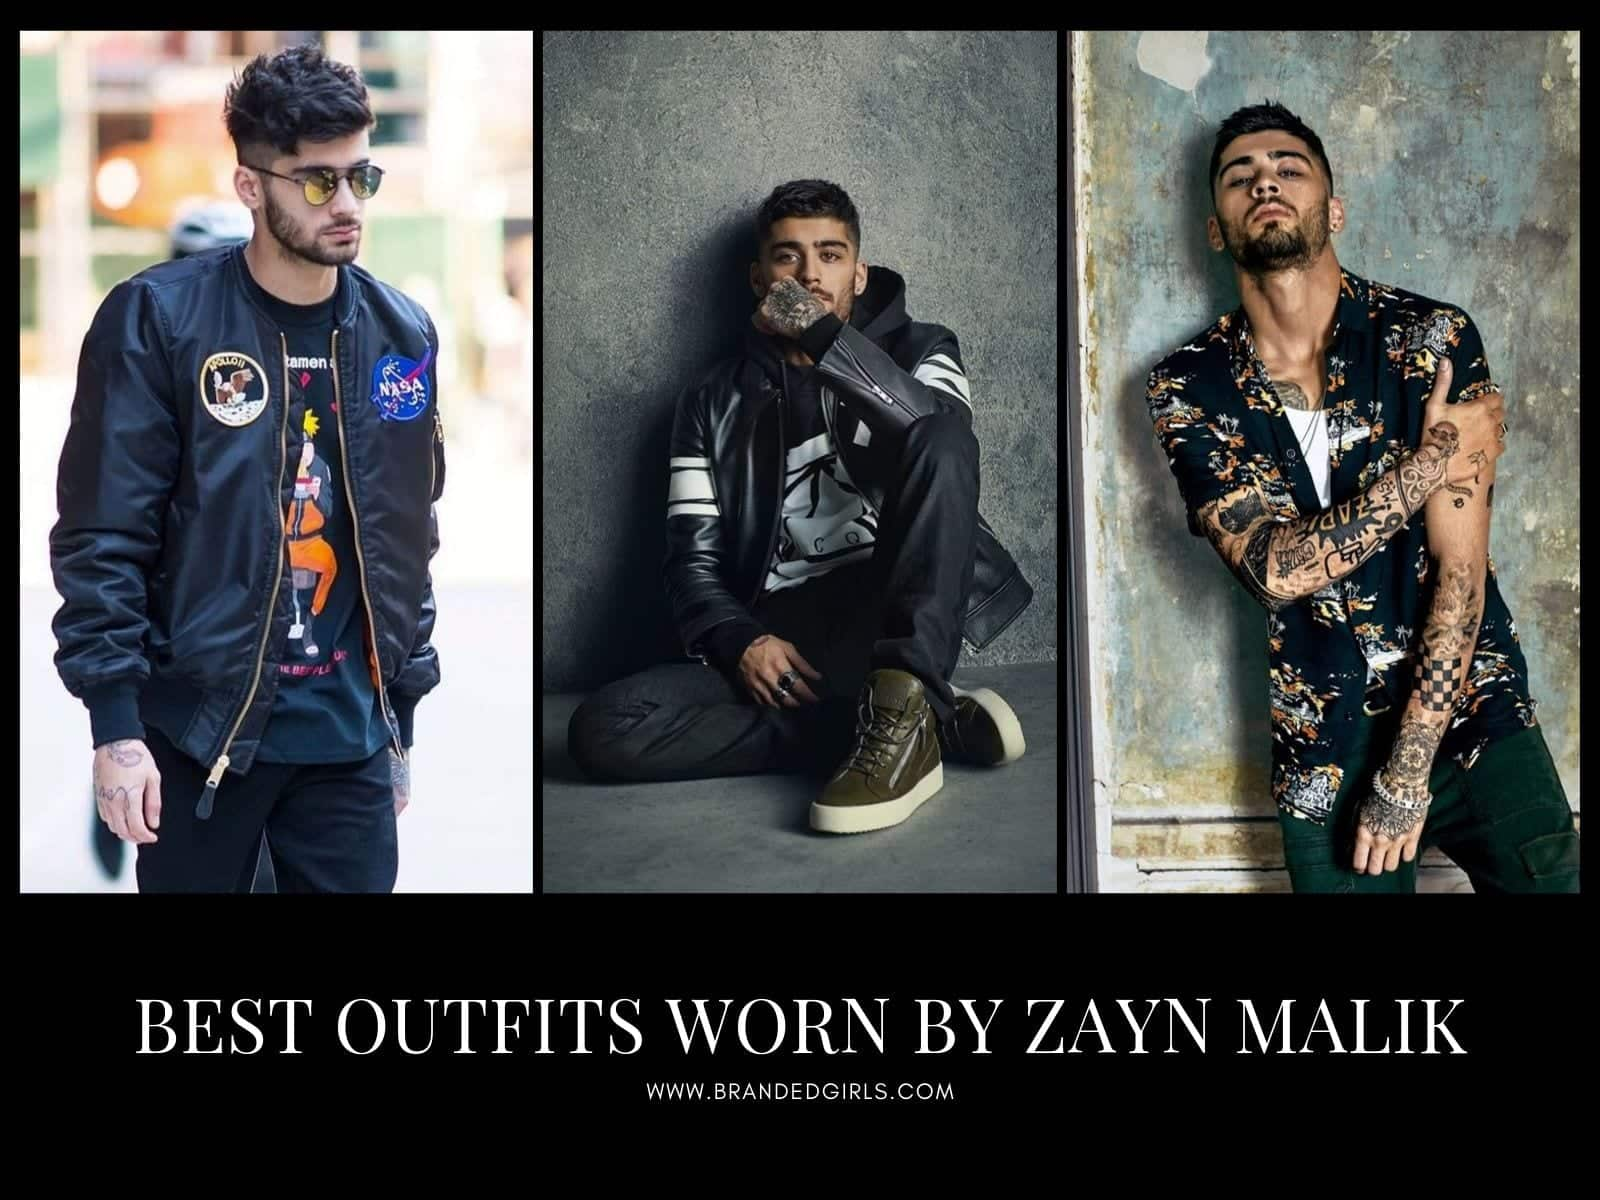 Best-Outfits-Worn-by-Zayn-Malik Zayn Malik Outfits - 20 Best Outfits & Looks Of Zayn Malik